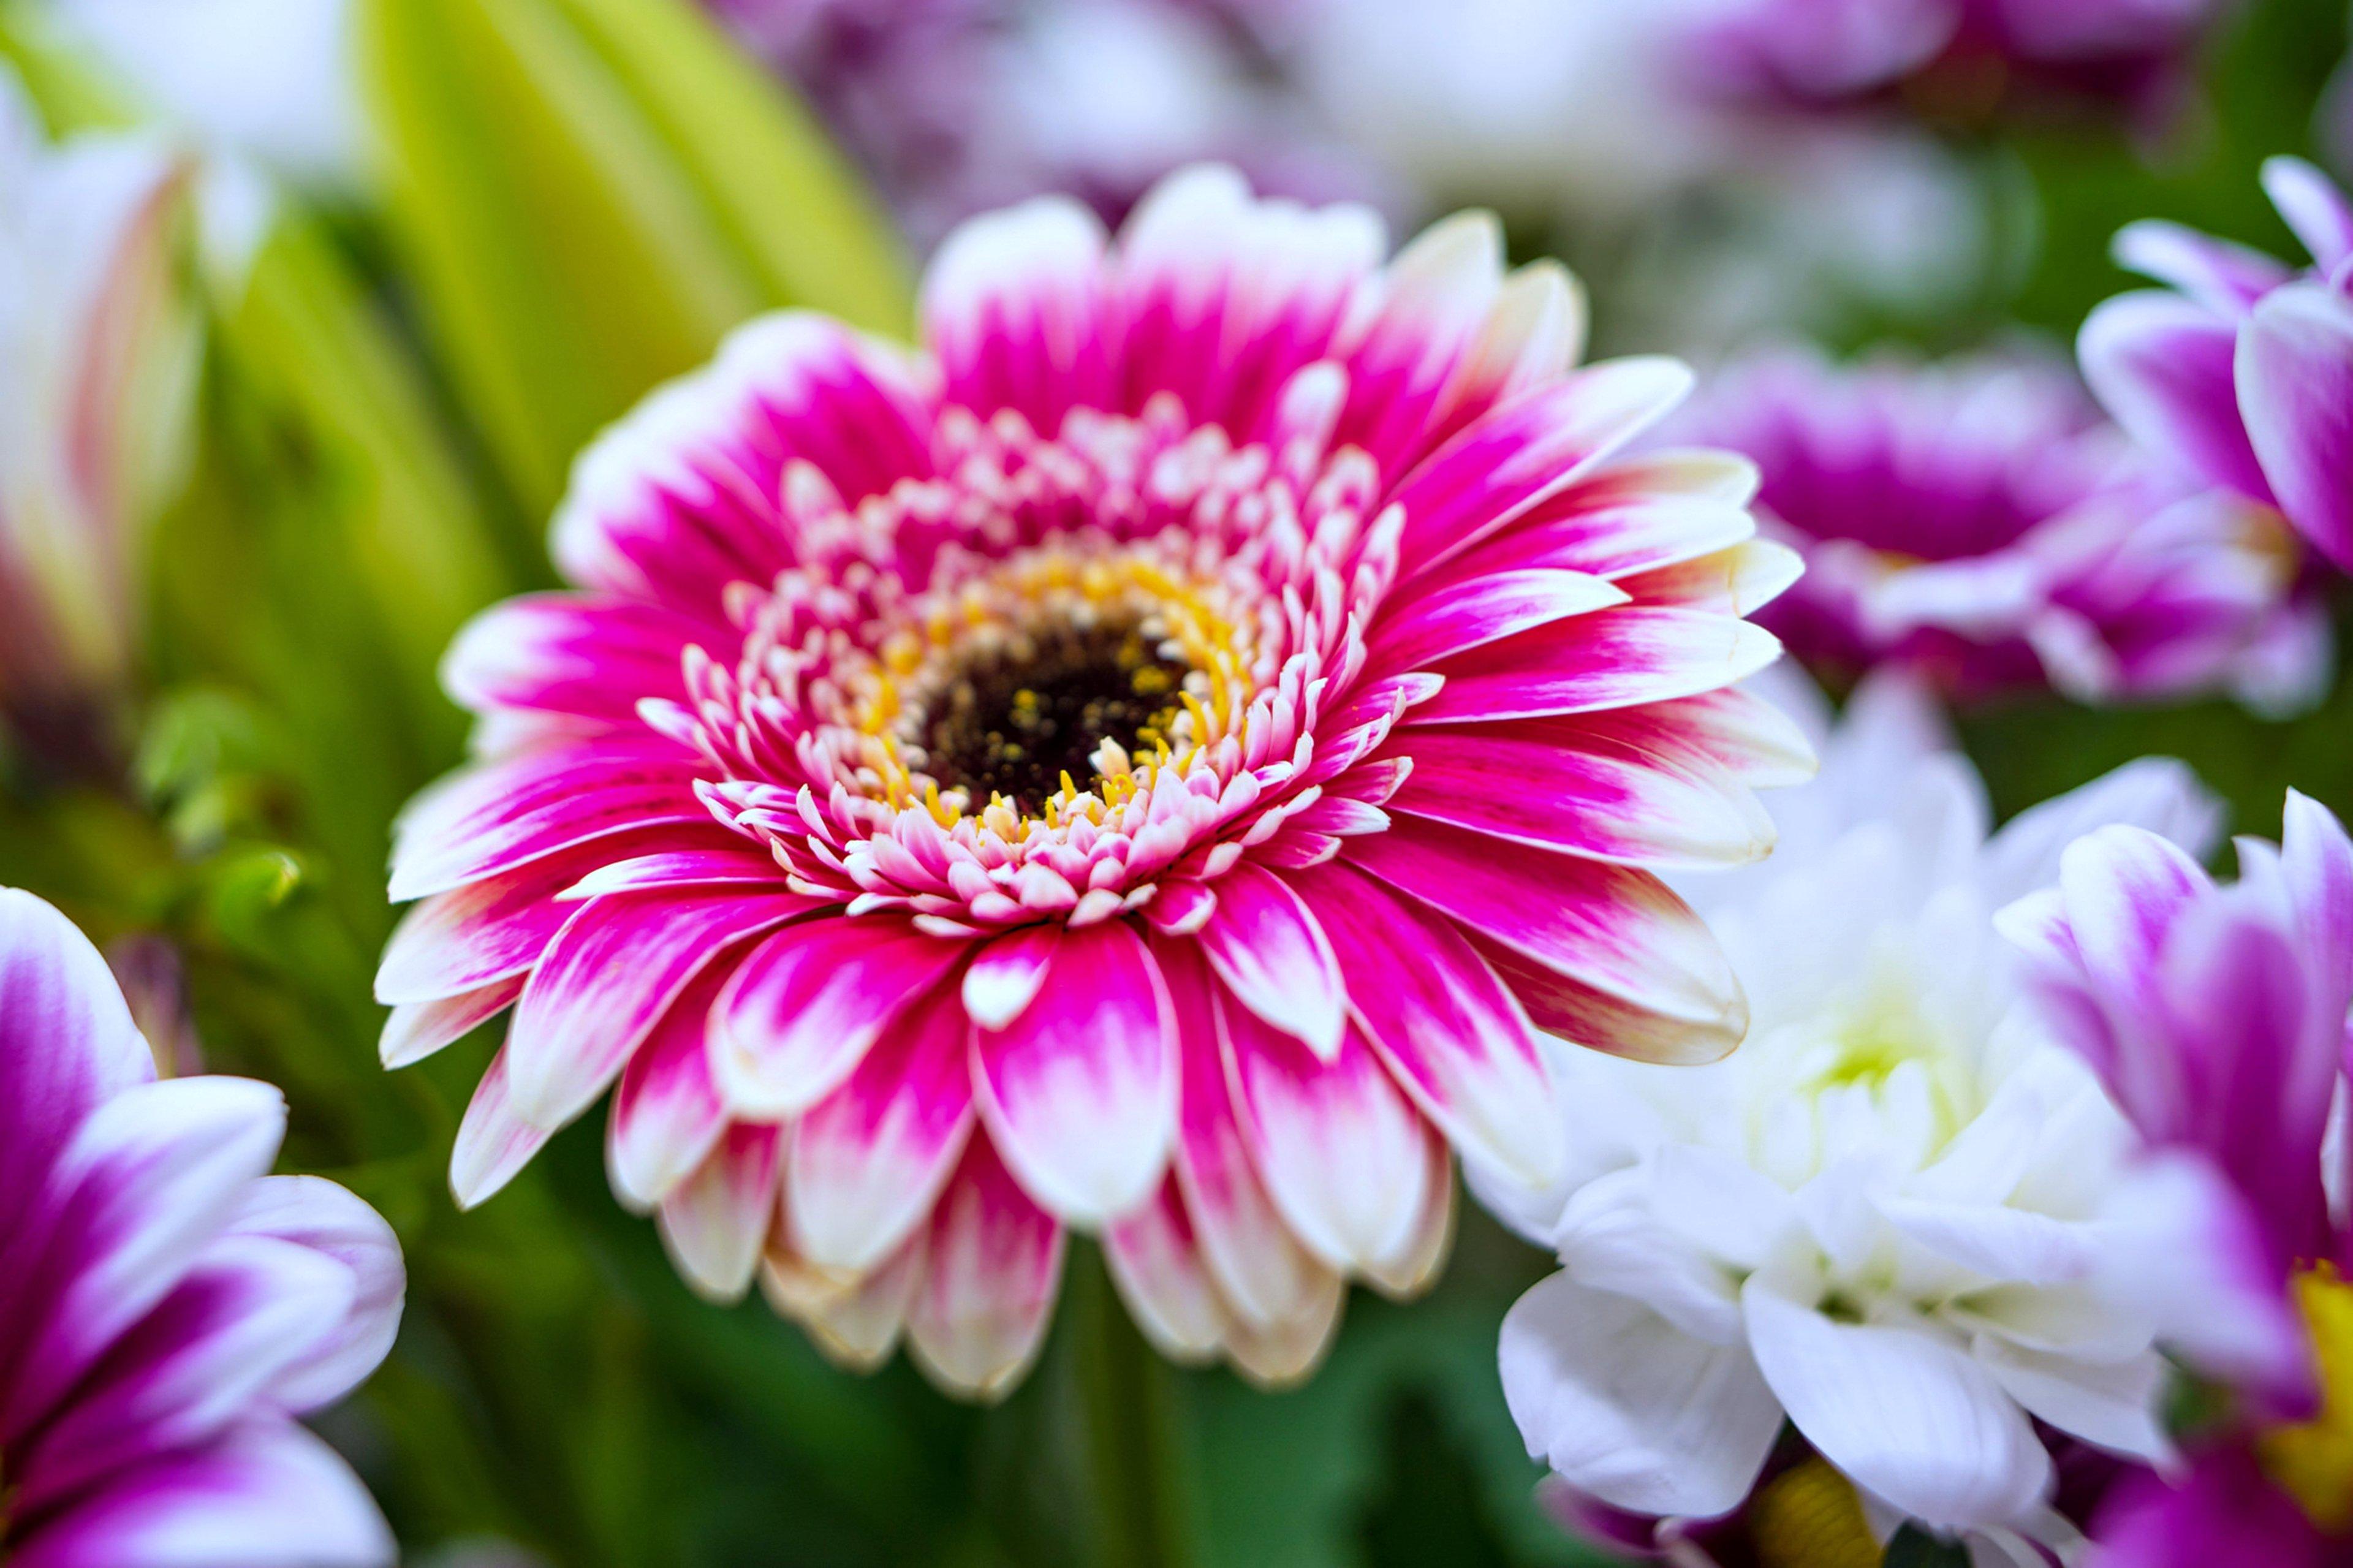 Beautiful Flower Full Hd 3840x2559 Download Hd Wallpaper Wallpapertip